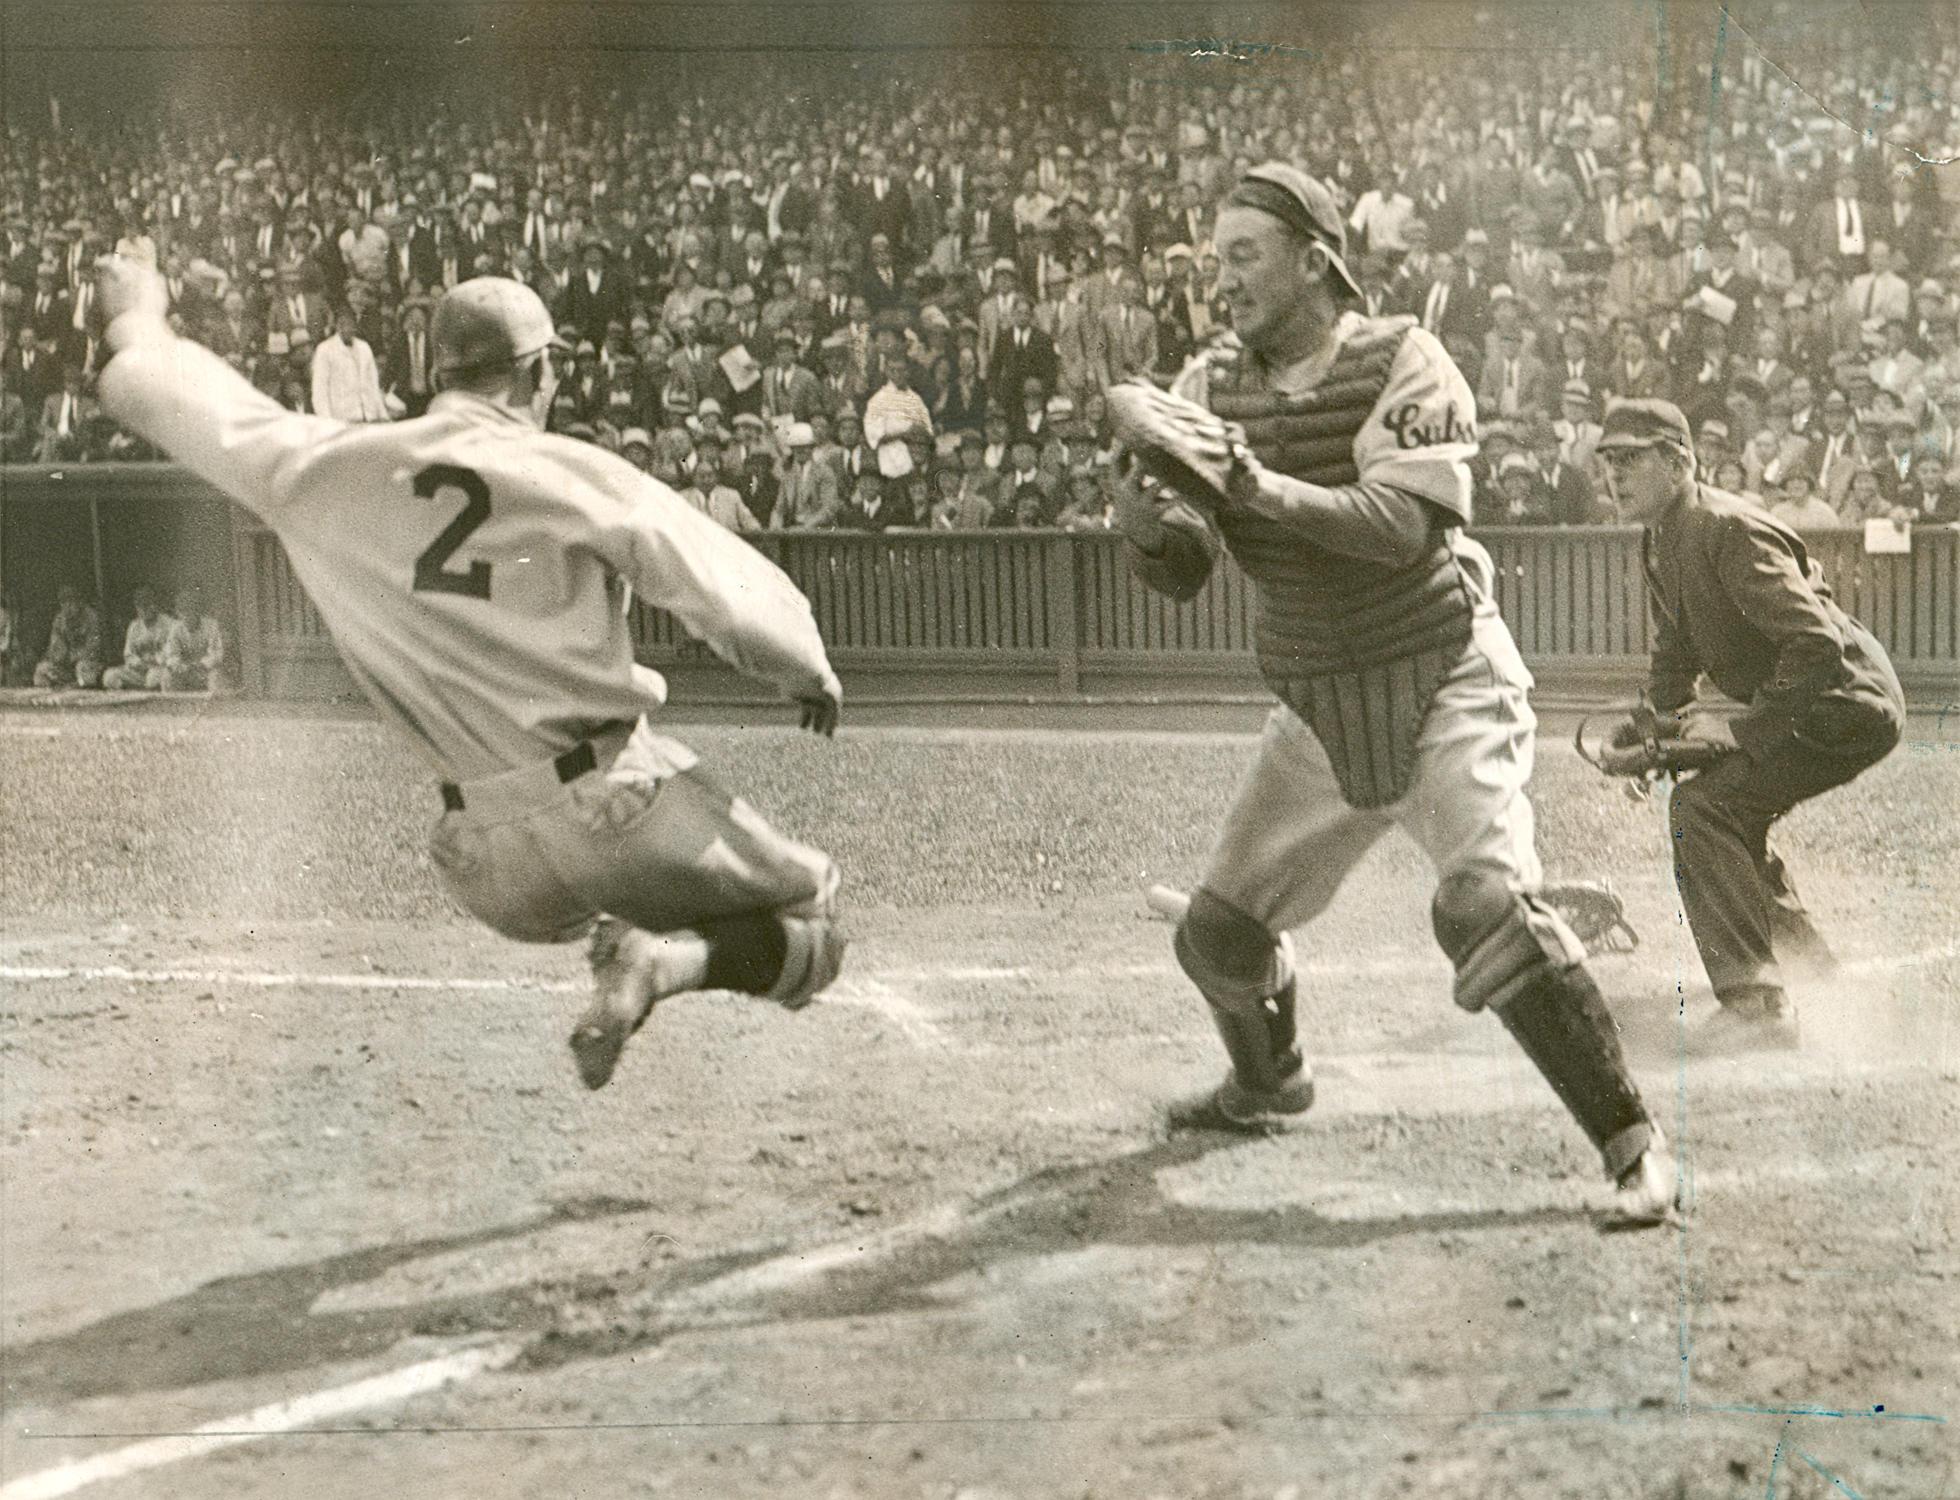 Museums-national_baseball_hall-of-fame_central-new-york21.jpg